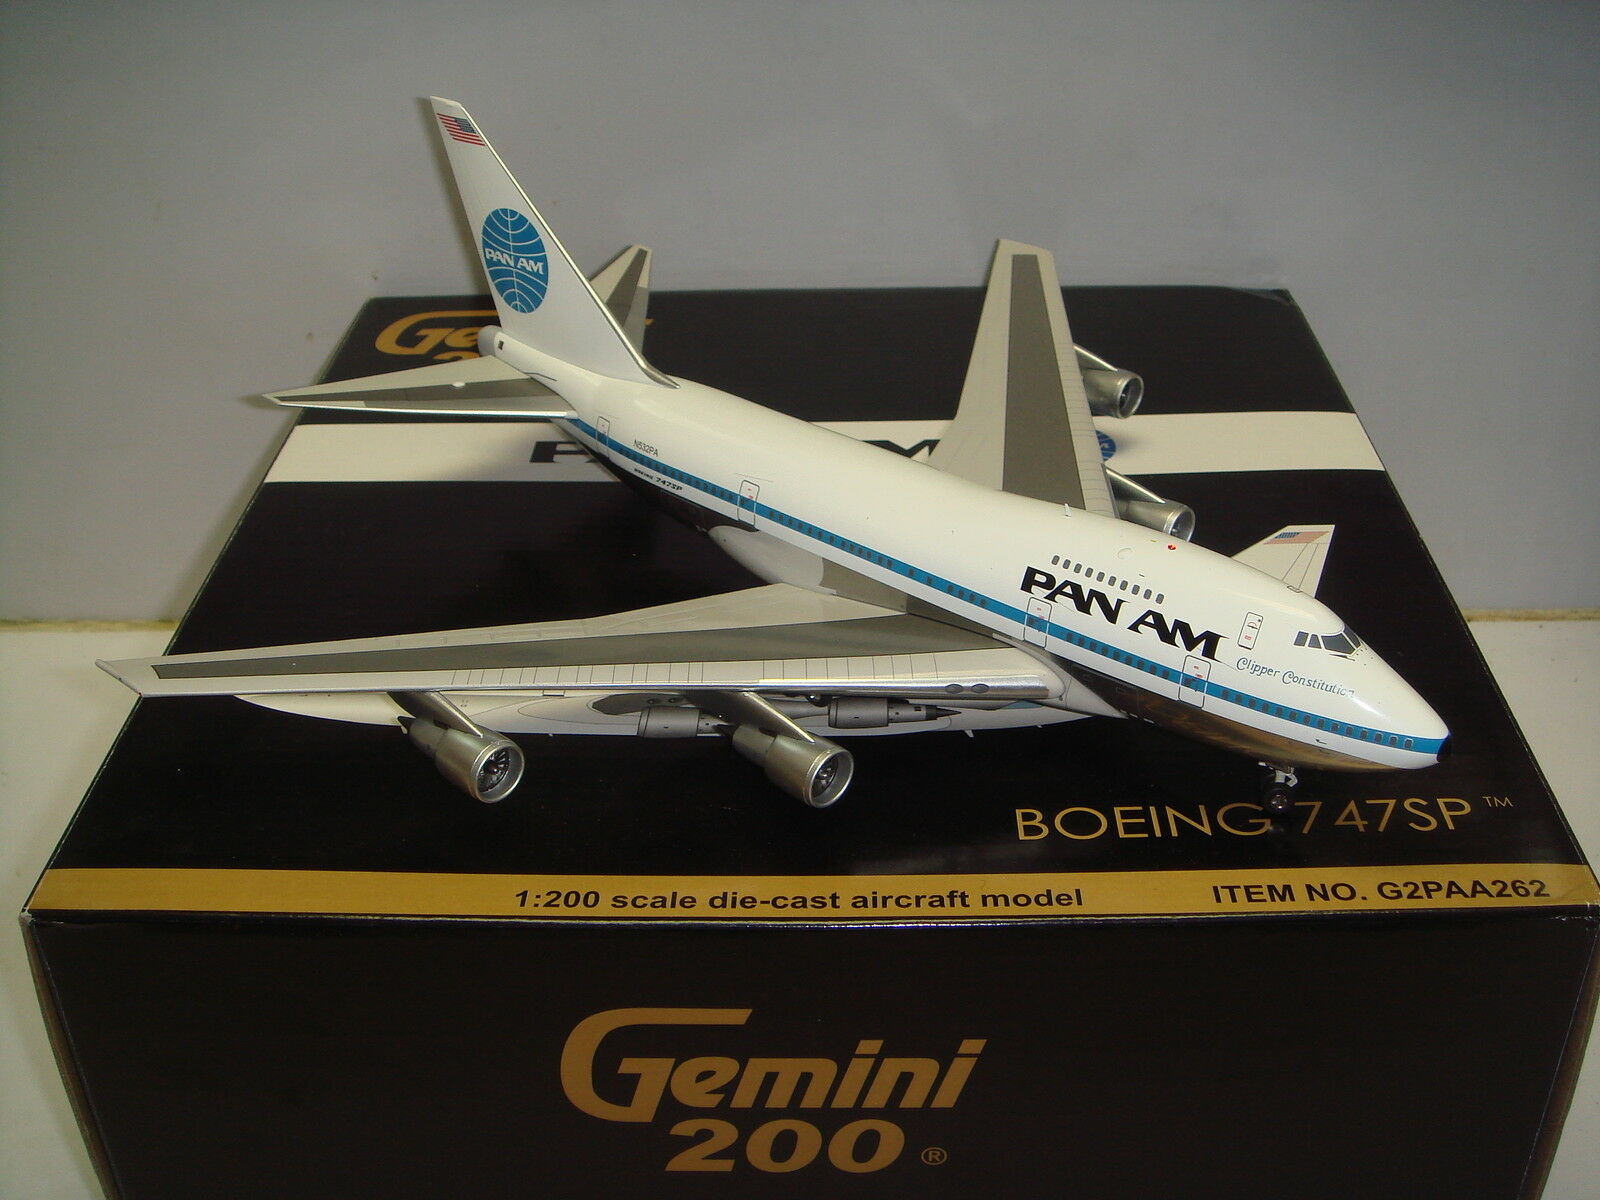 Gemini Gemini Gemini Jets 200 Pan American Pan Am B747-SP  1970s Color-Clipper Constitución   ahorra hasta un 50%